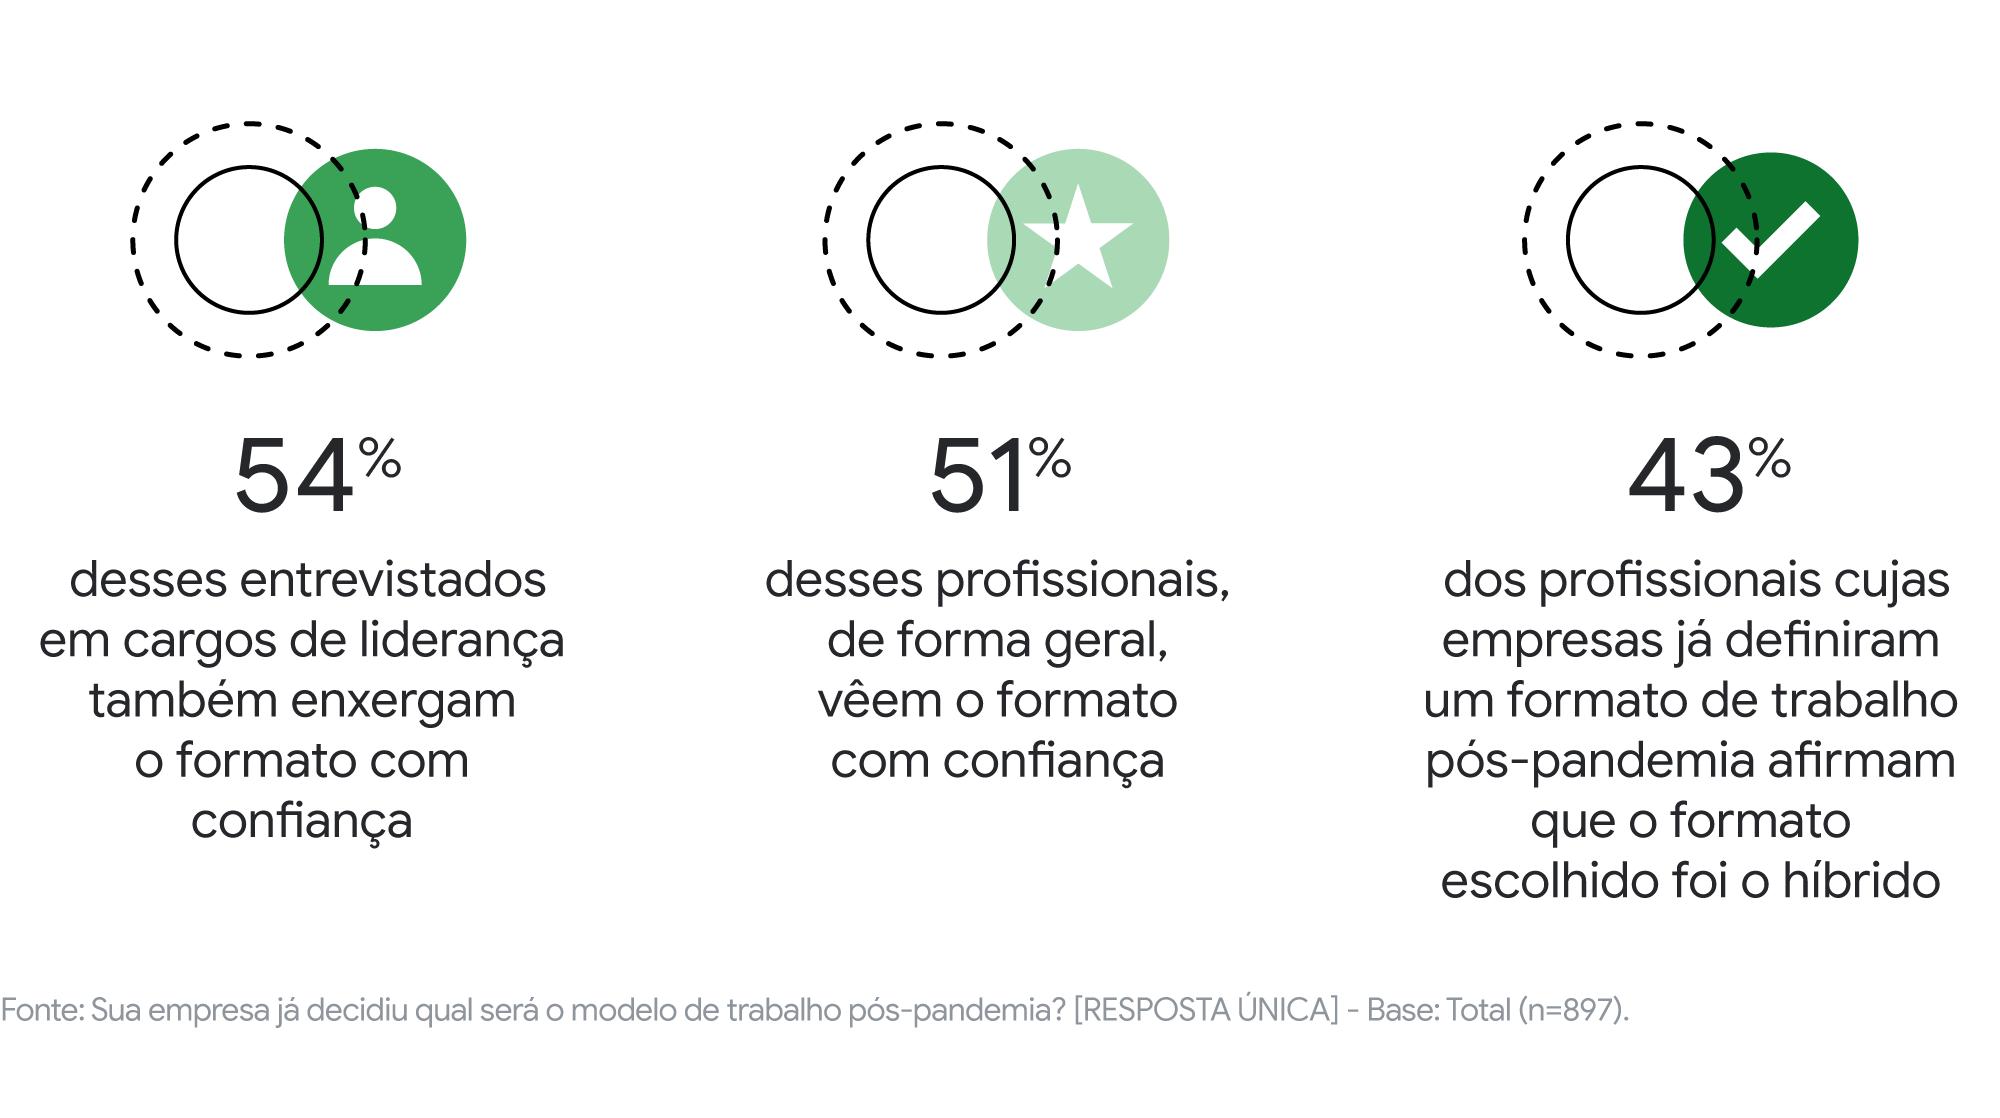 Como iremos trabalhar no pós-pandemia? Descubra dados e insights sobre o futuro dos escritórios brasileiros